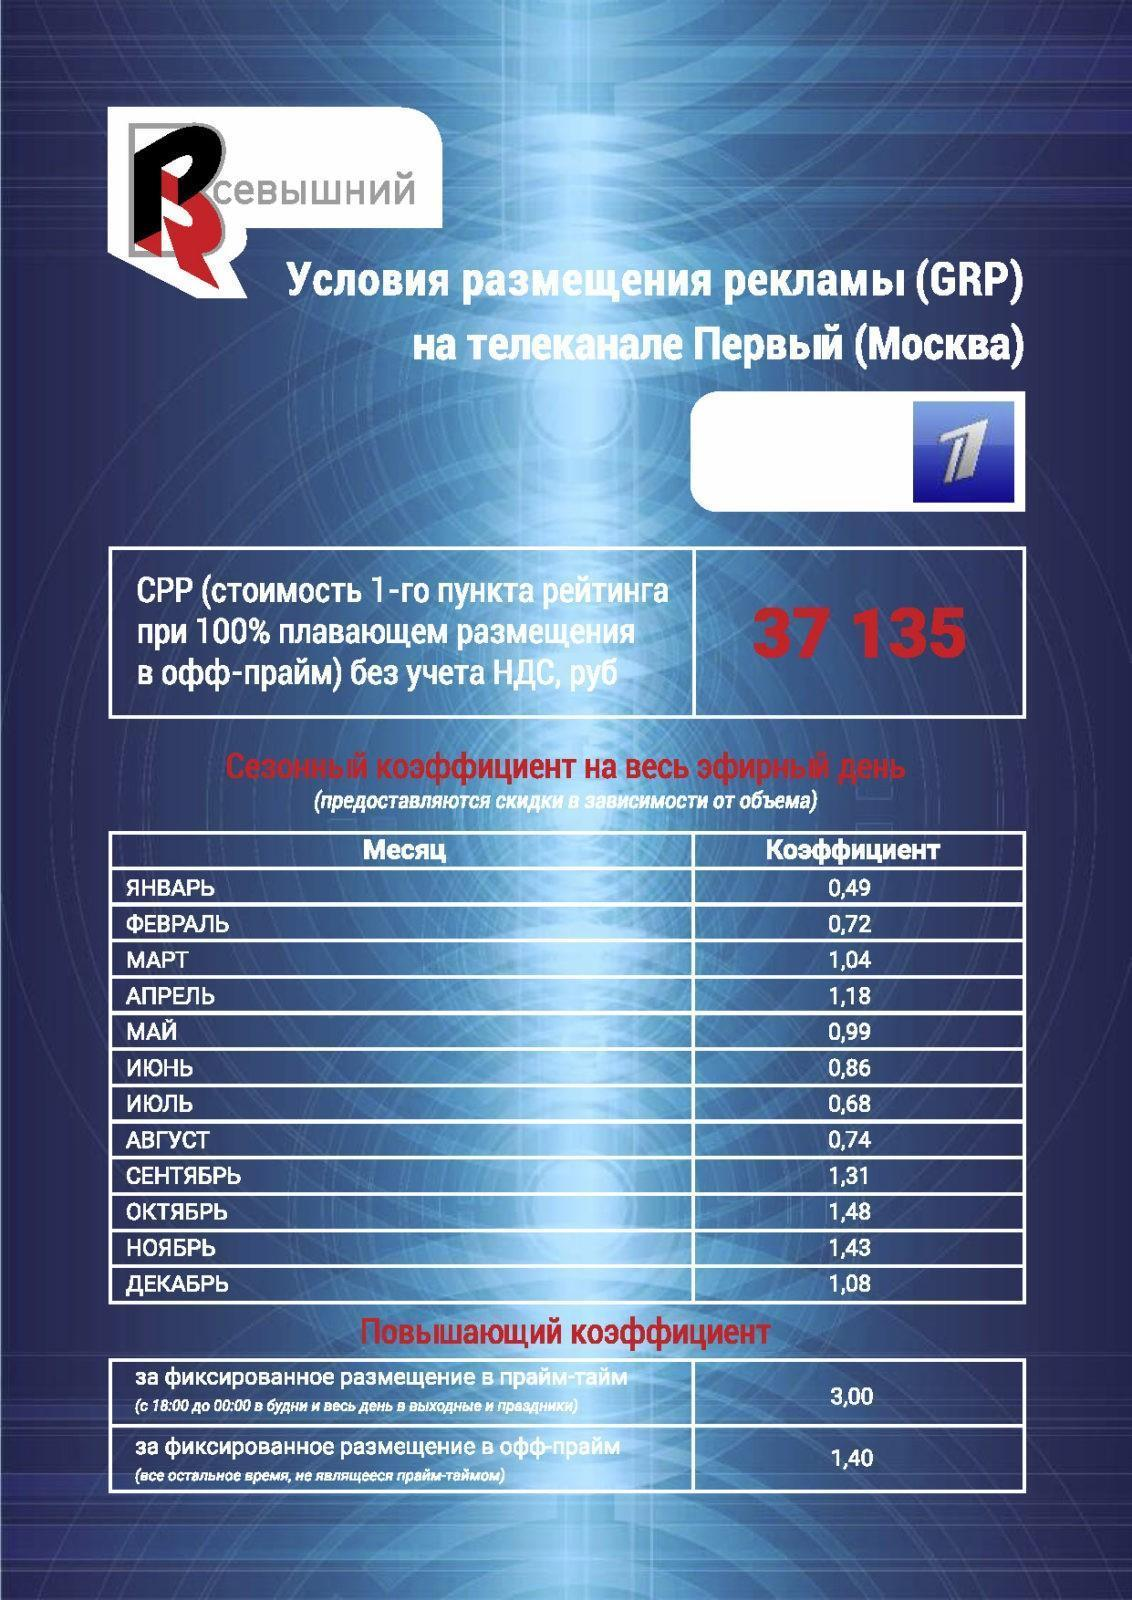 Реклама на Первом канале